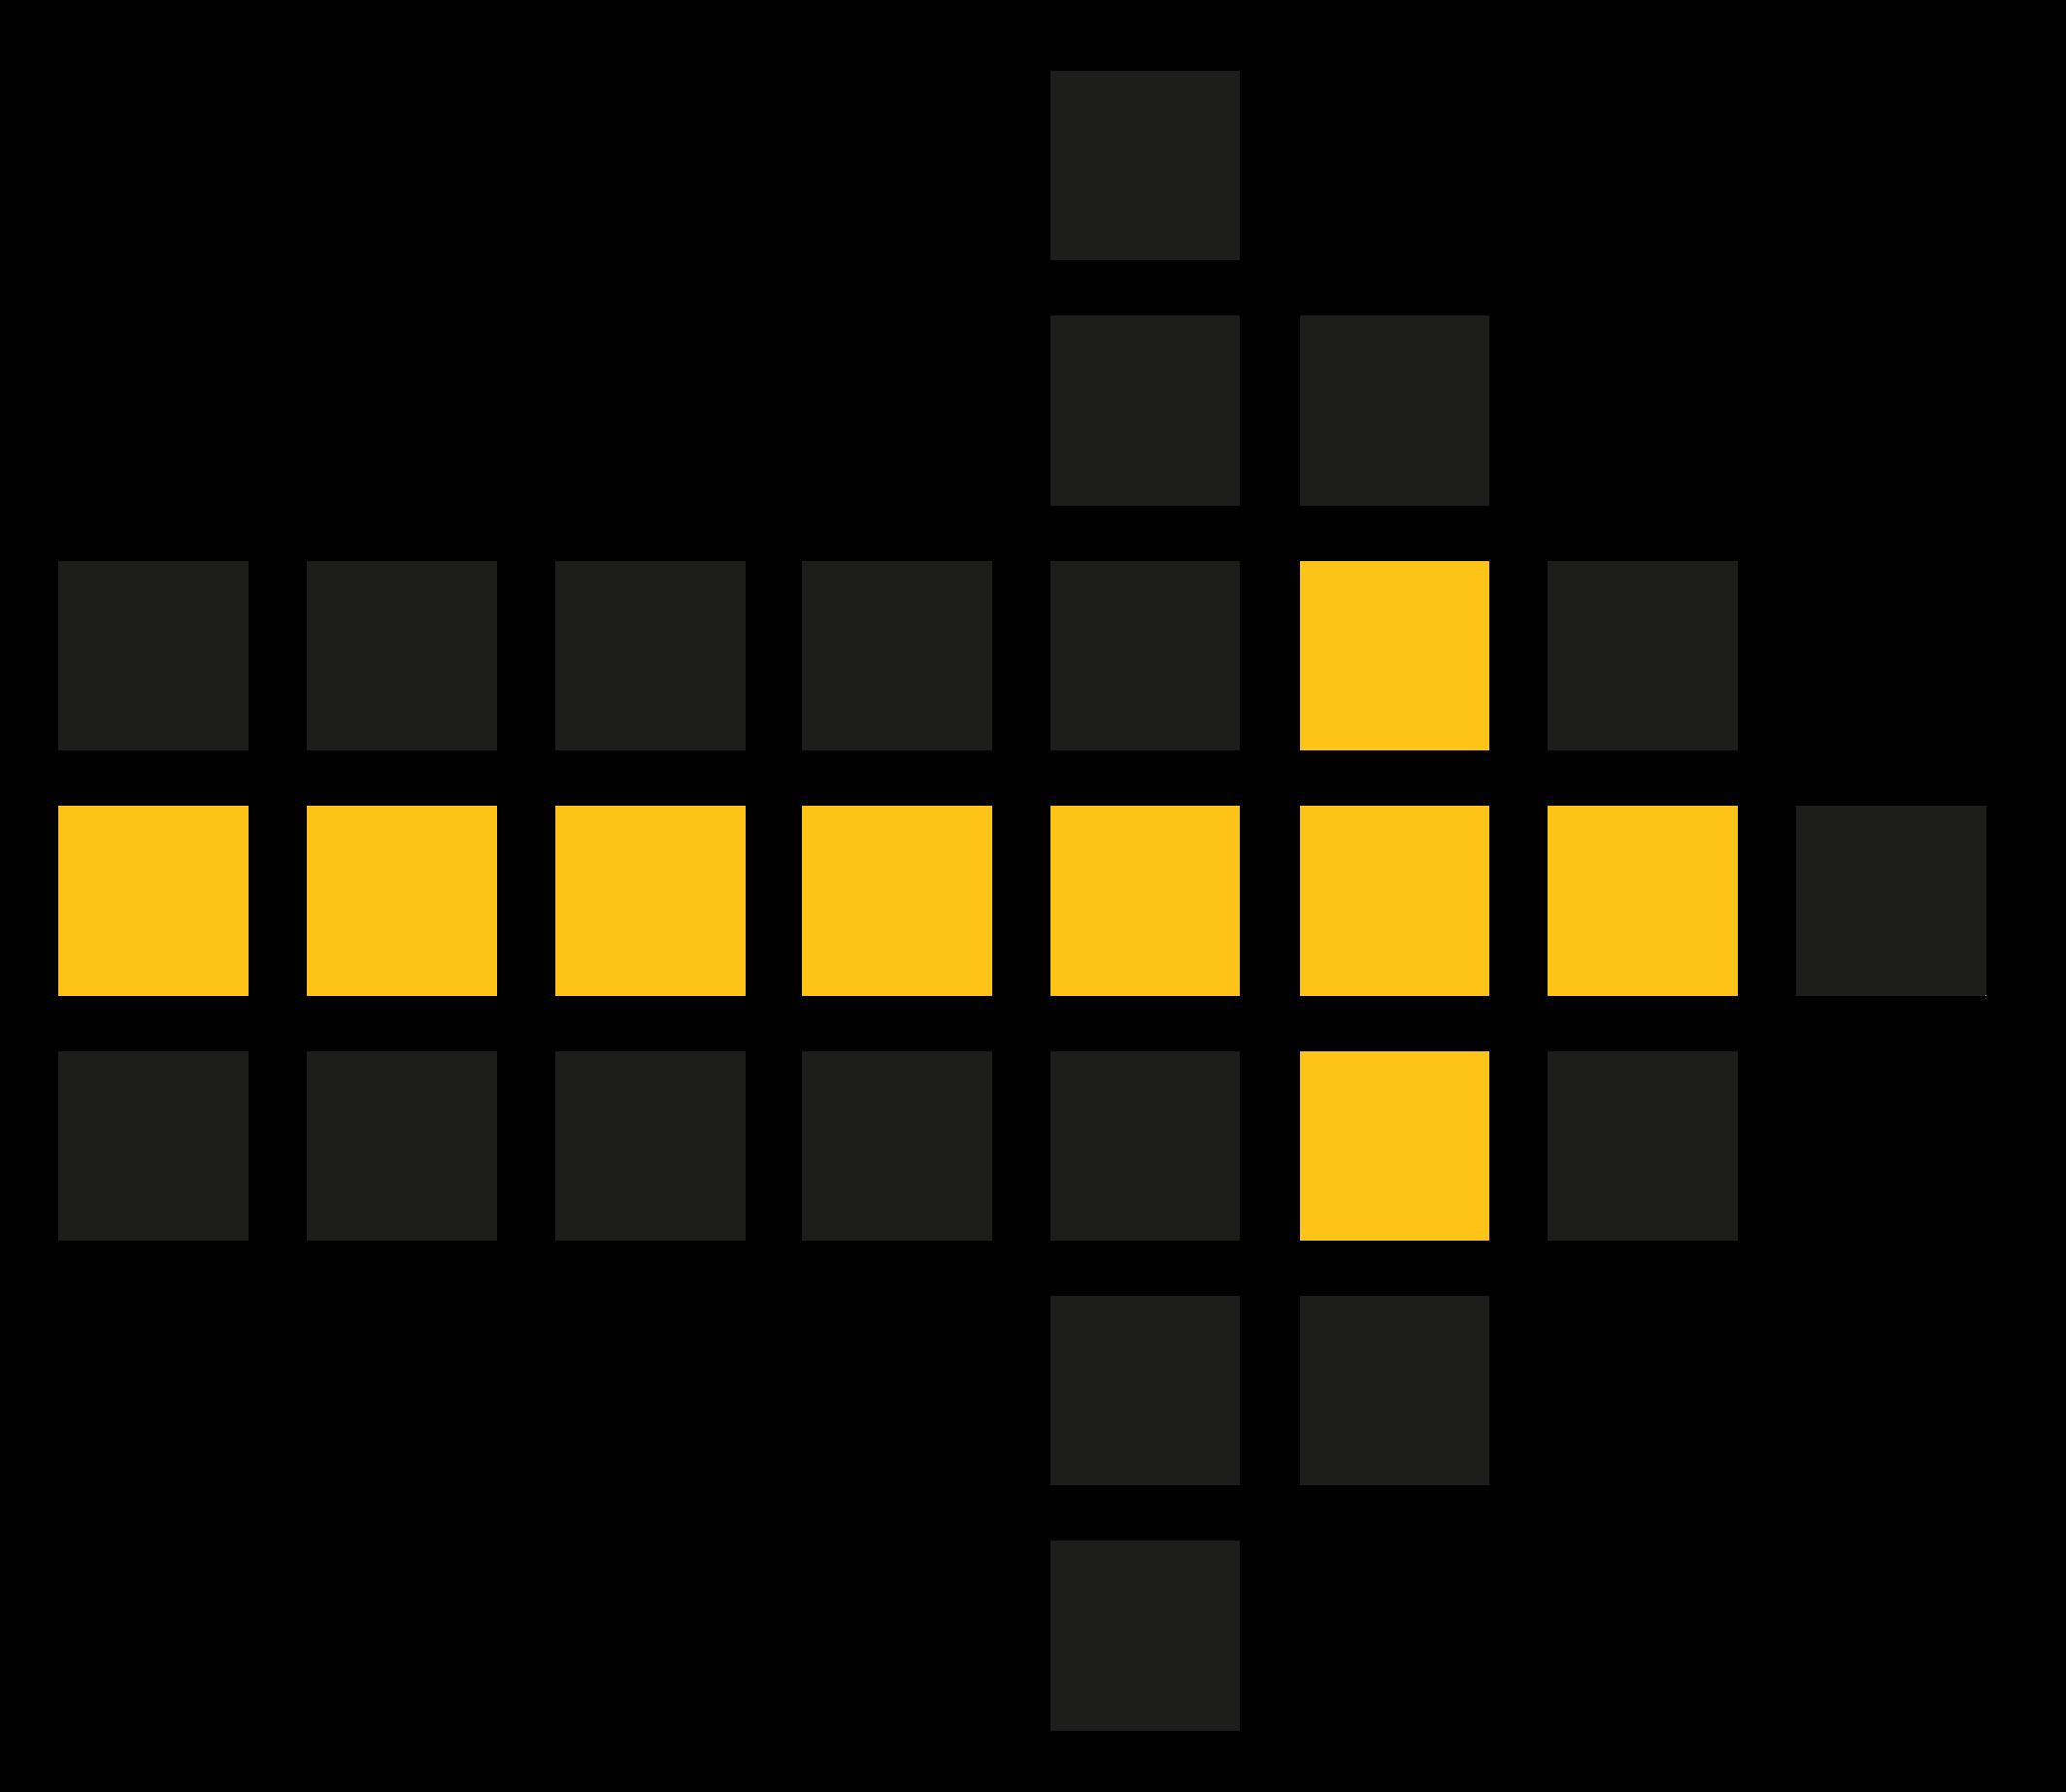 flecha-negra-amarilla-gala-formacion